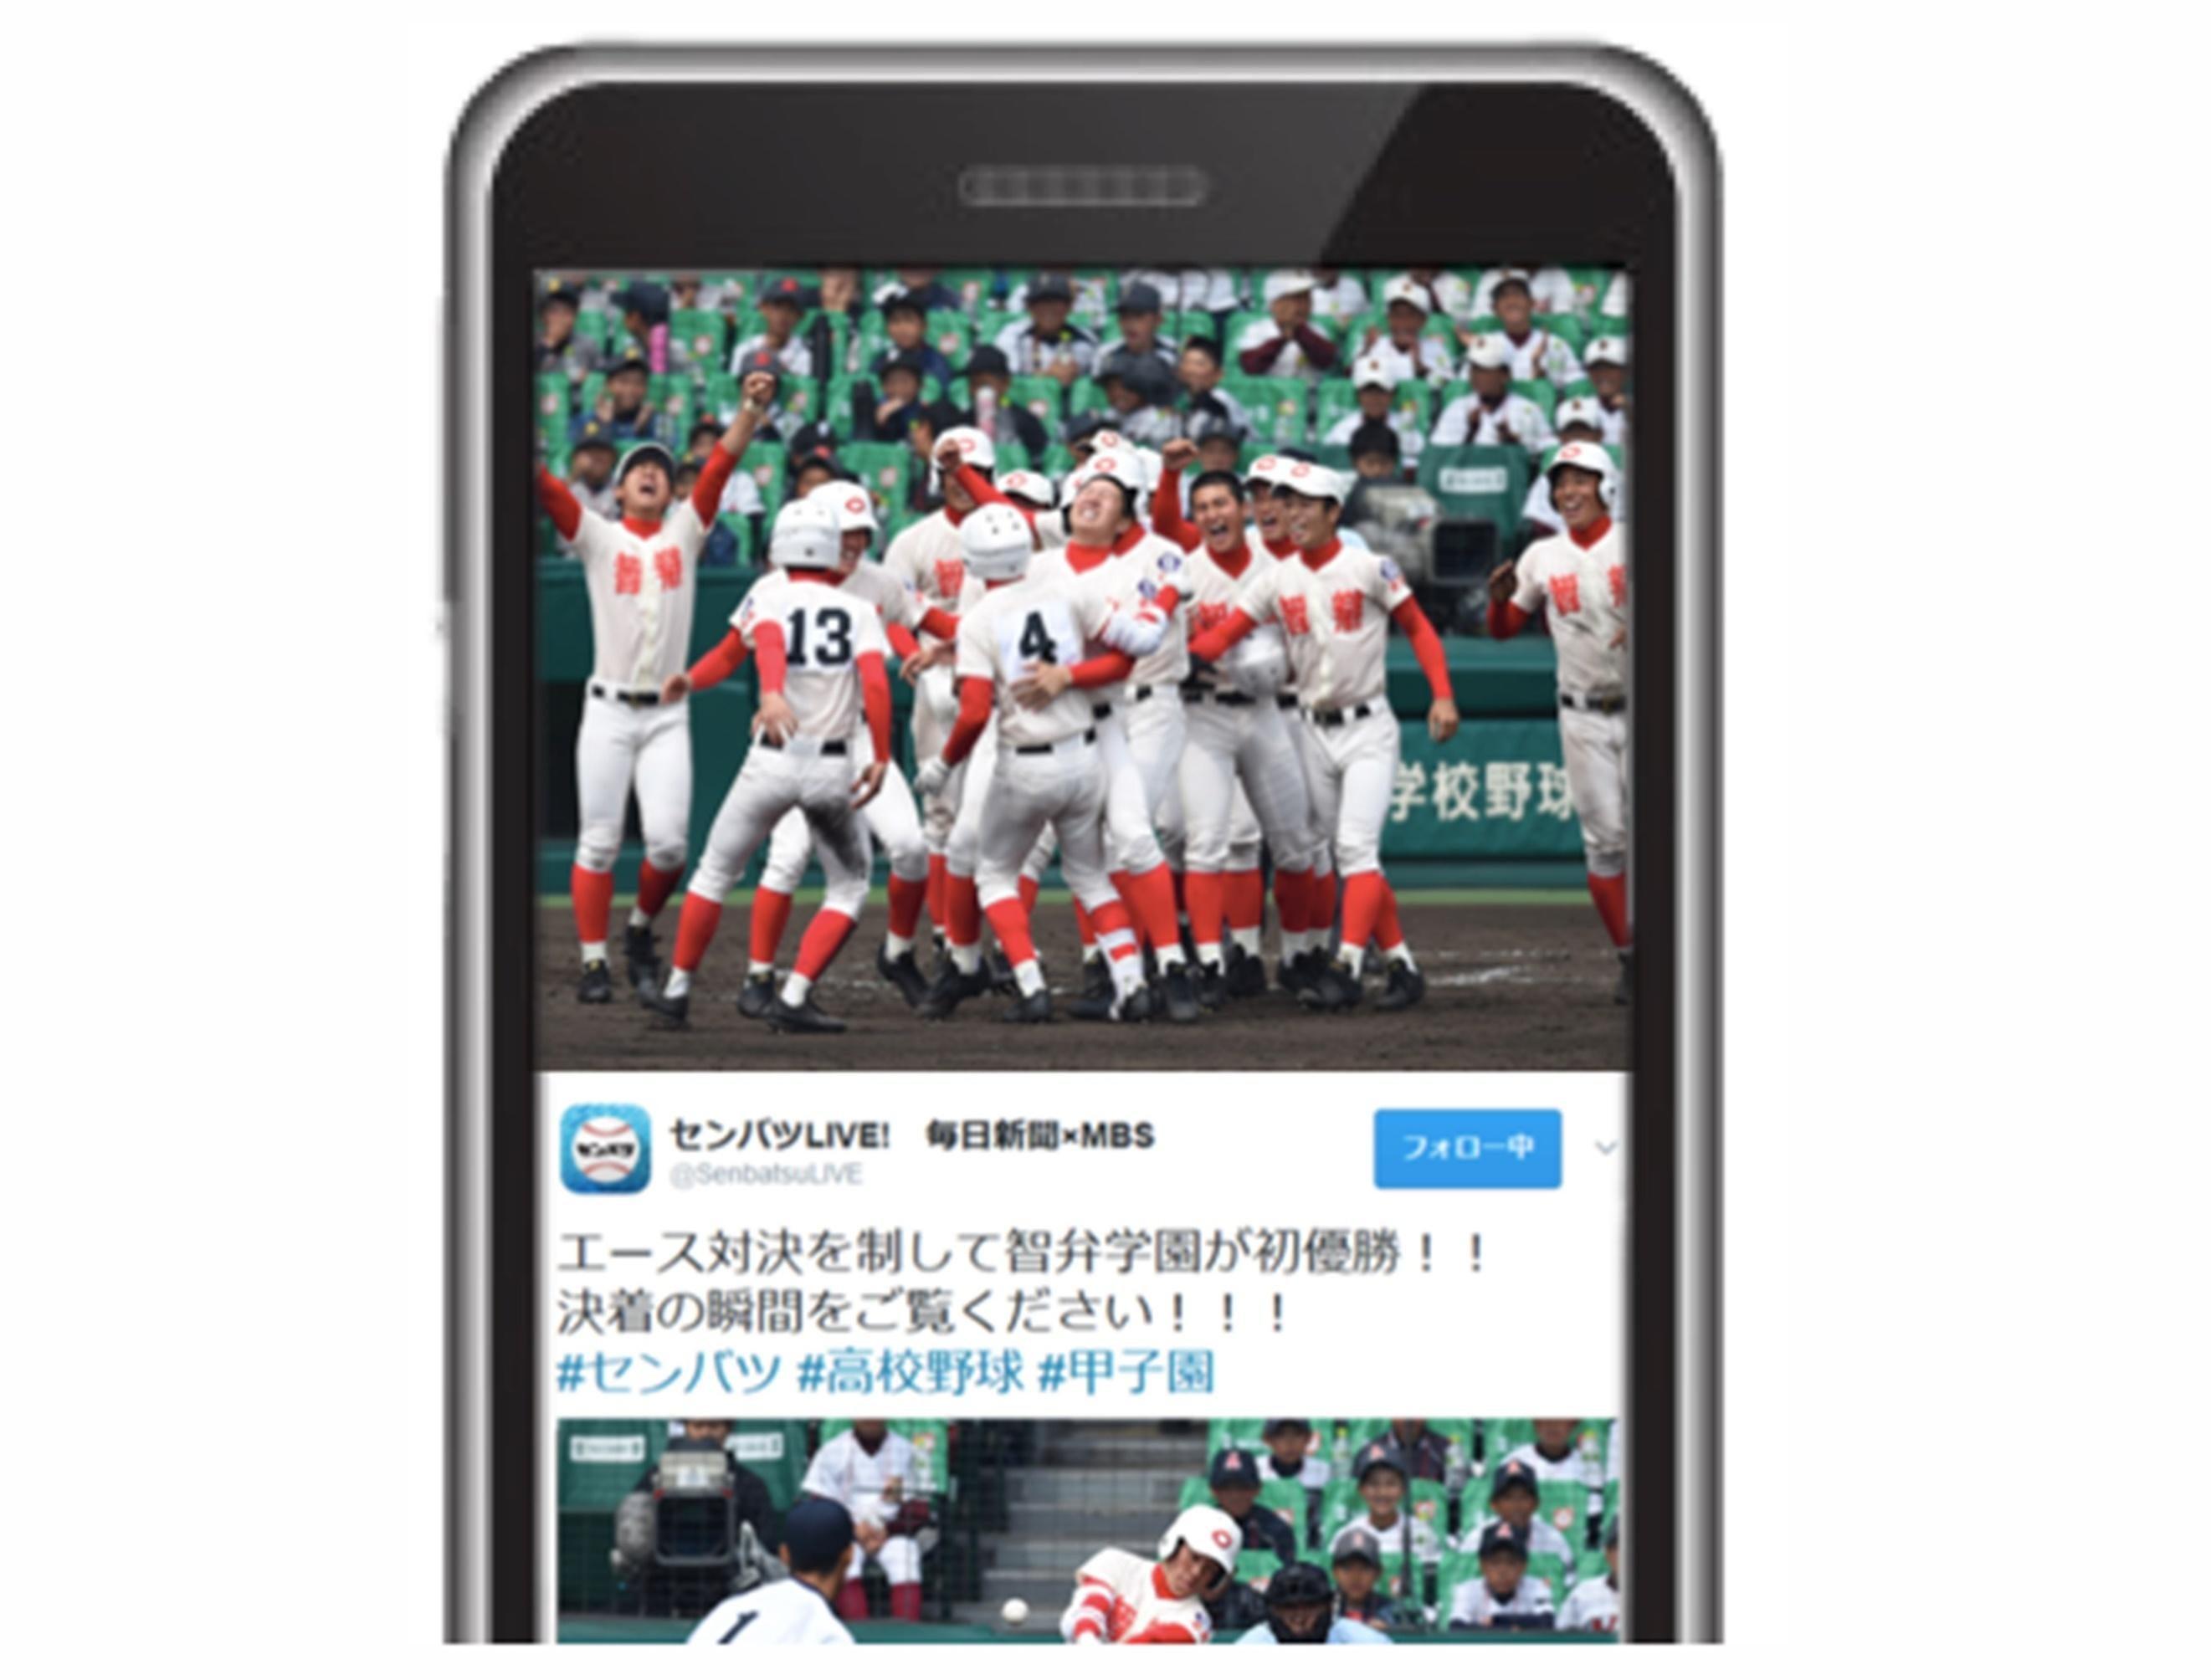 Twitter、春のセンバツ高校野球の初戦と決勝をライブ配信